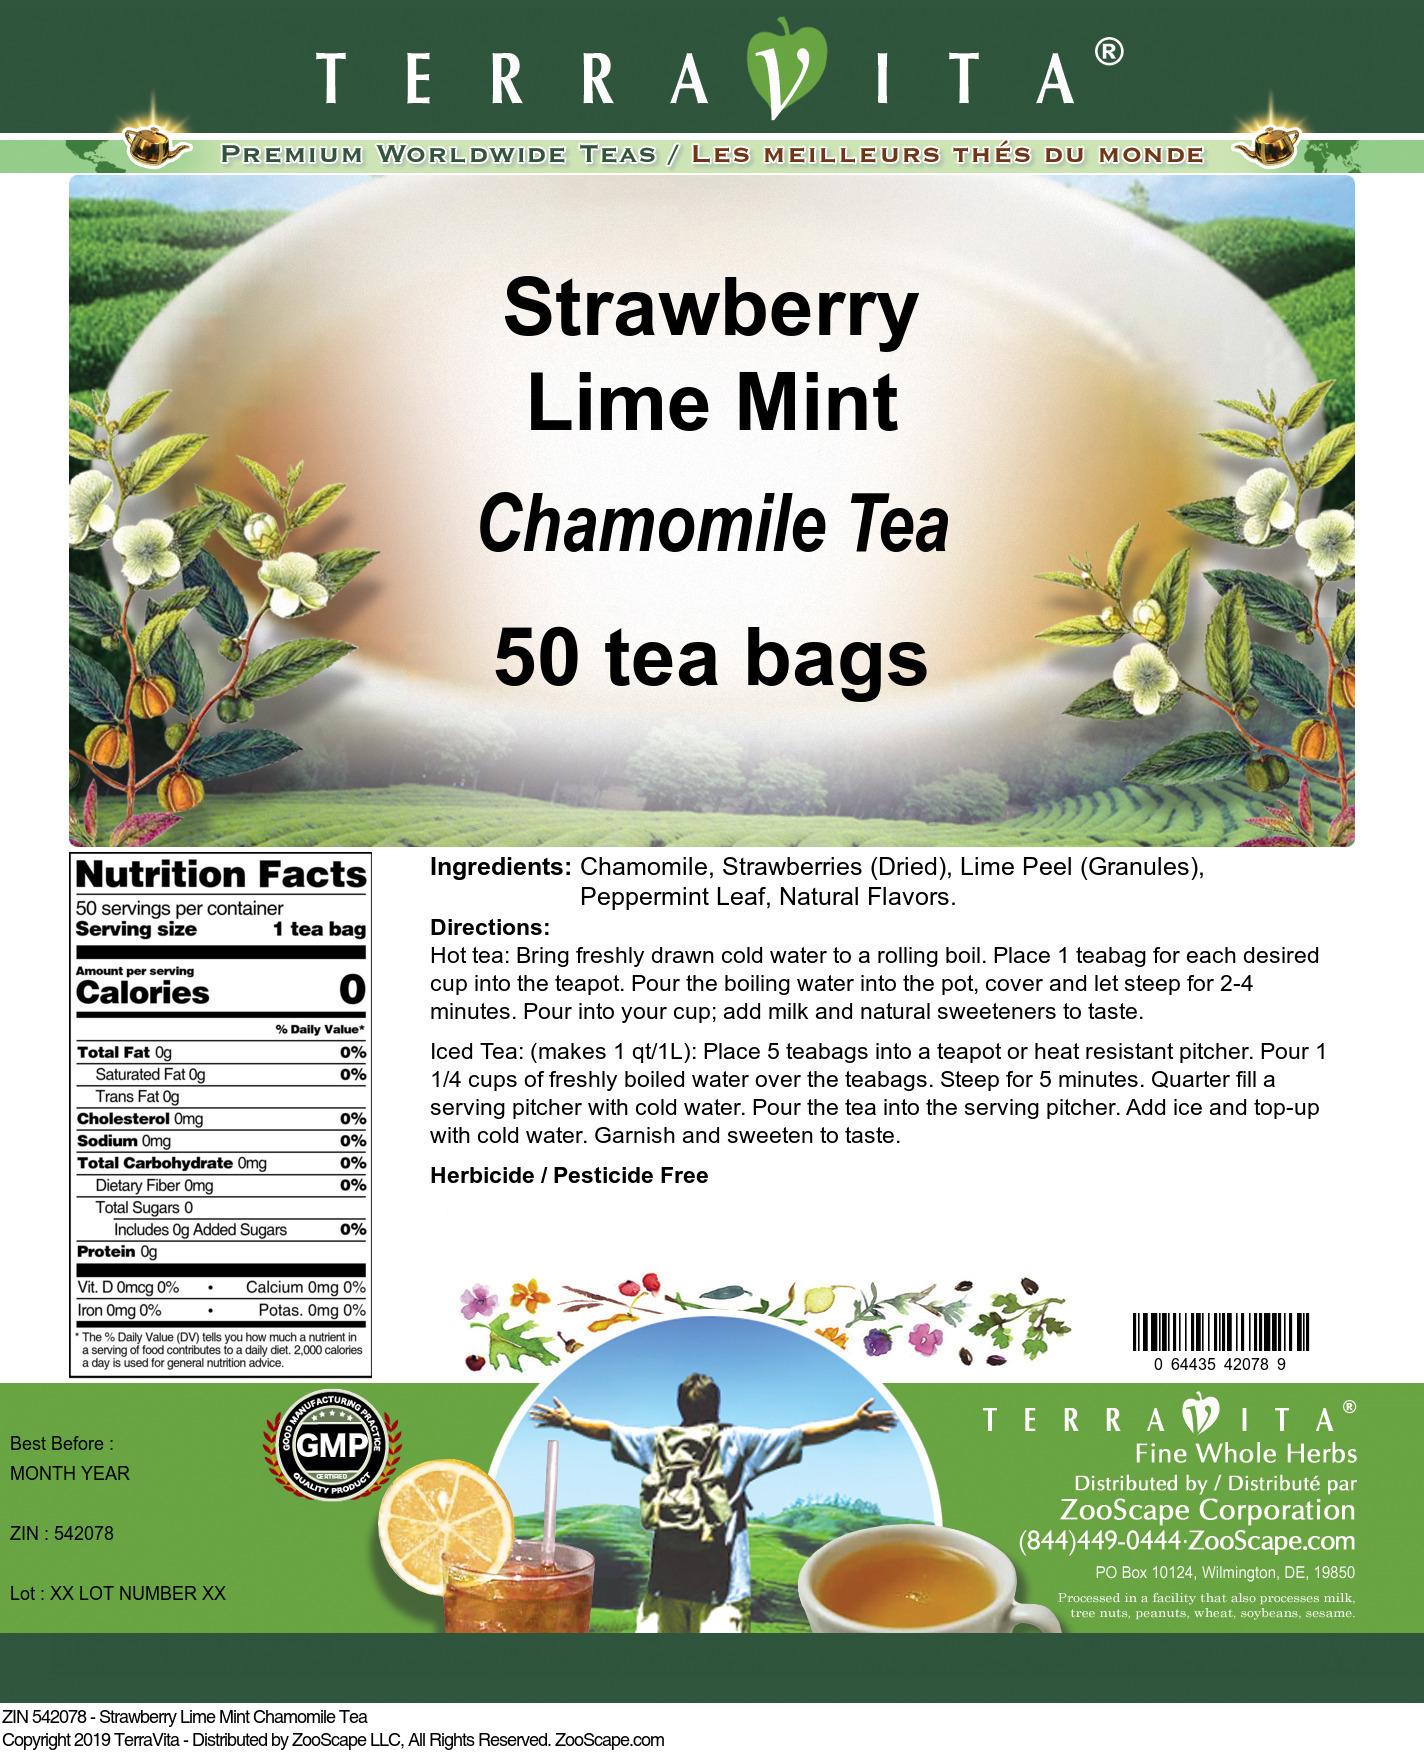 Strawberry Lime Mint Chamomile Tea